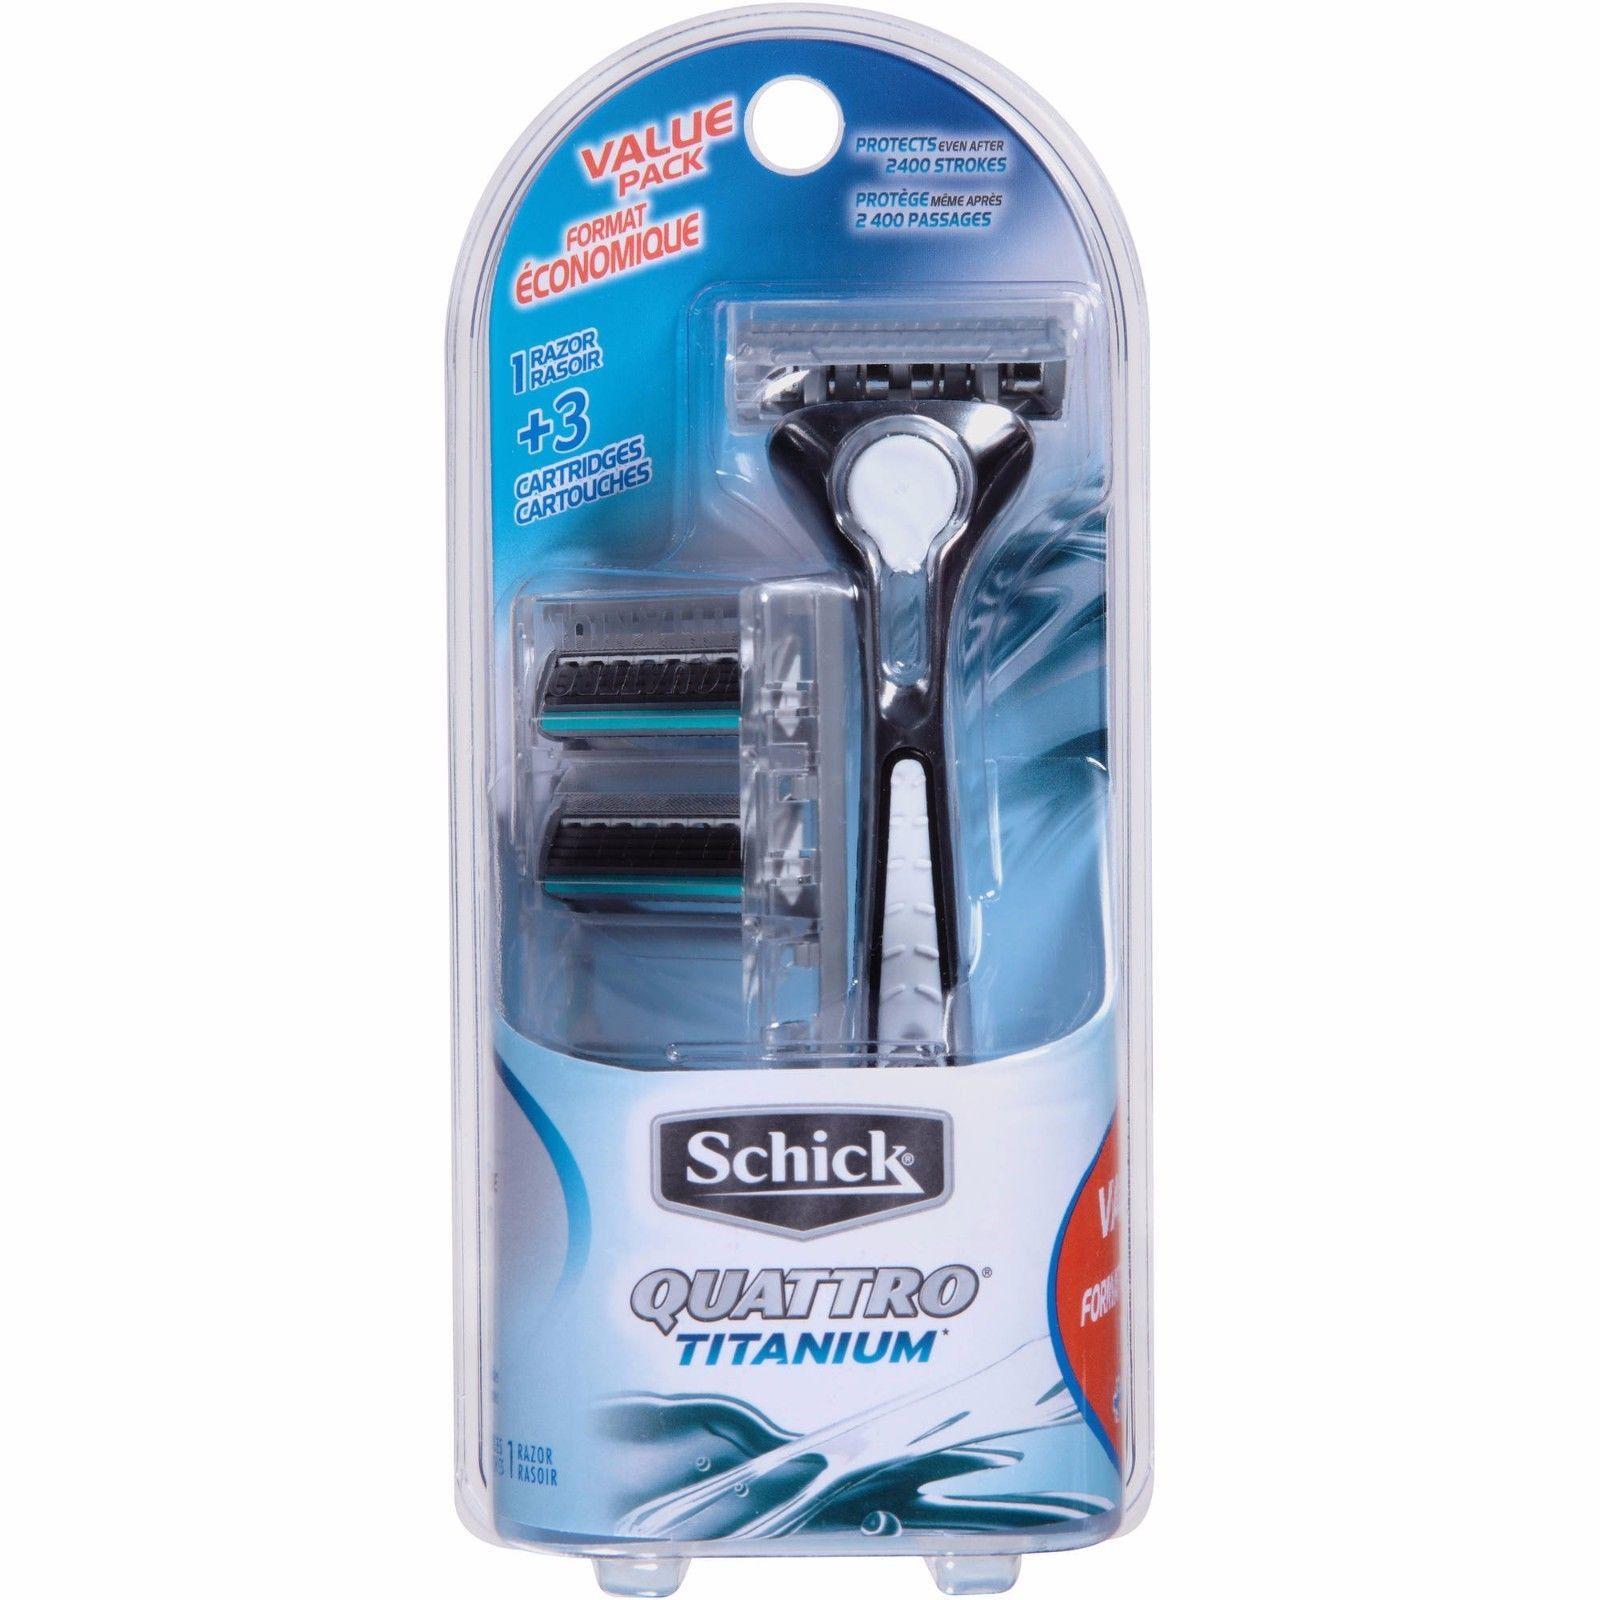 Schick Quattro Tweezer 1 Listing Panasonic Es Rw30 Rechargeable Electric Shaver With Flexible Pivoting Head Titanium Mens Razor Handle Plus 3 Refill Blades 1529